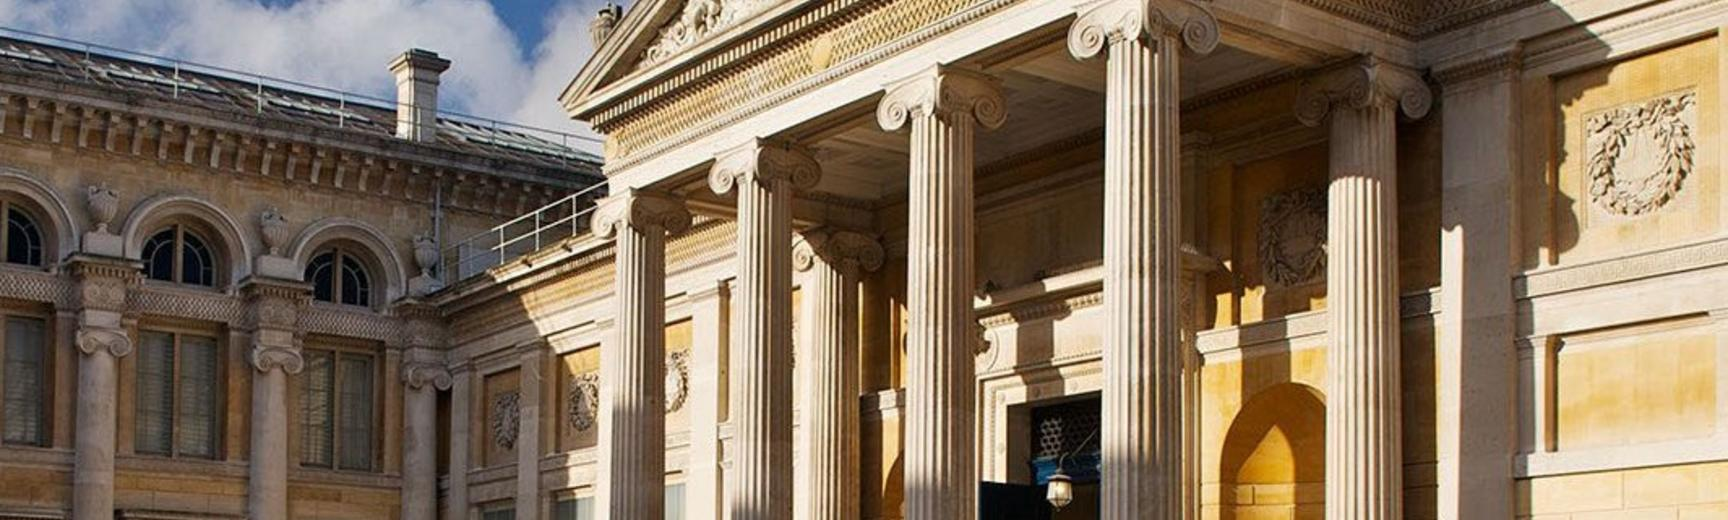 ashmolean museum exterior c greg smolonski